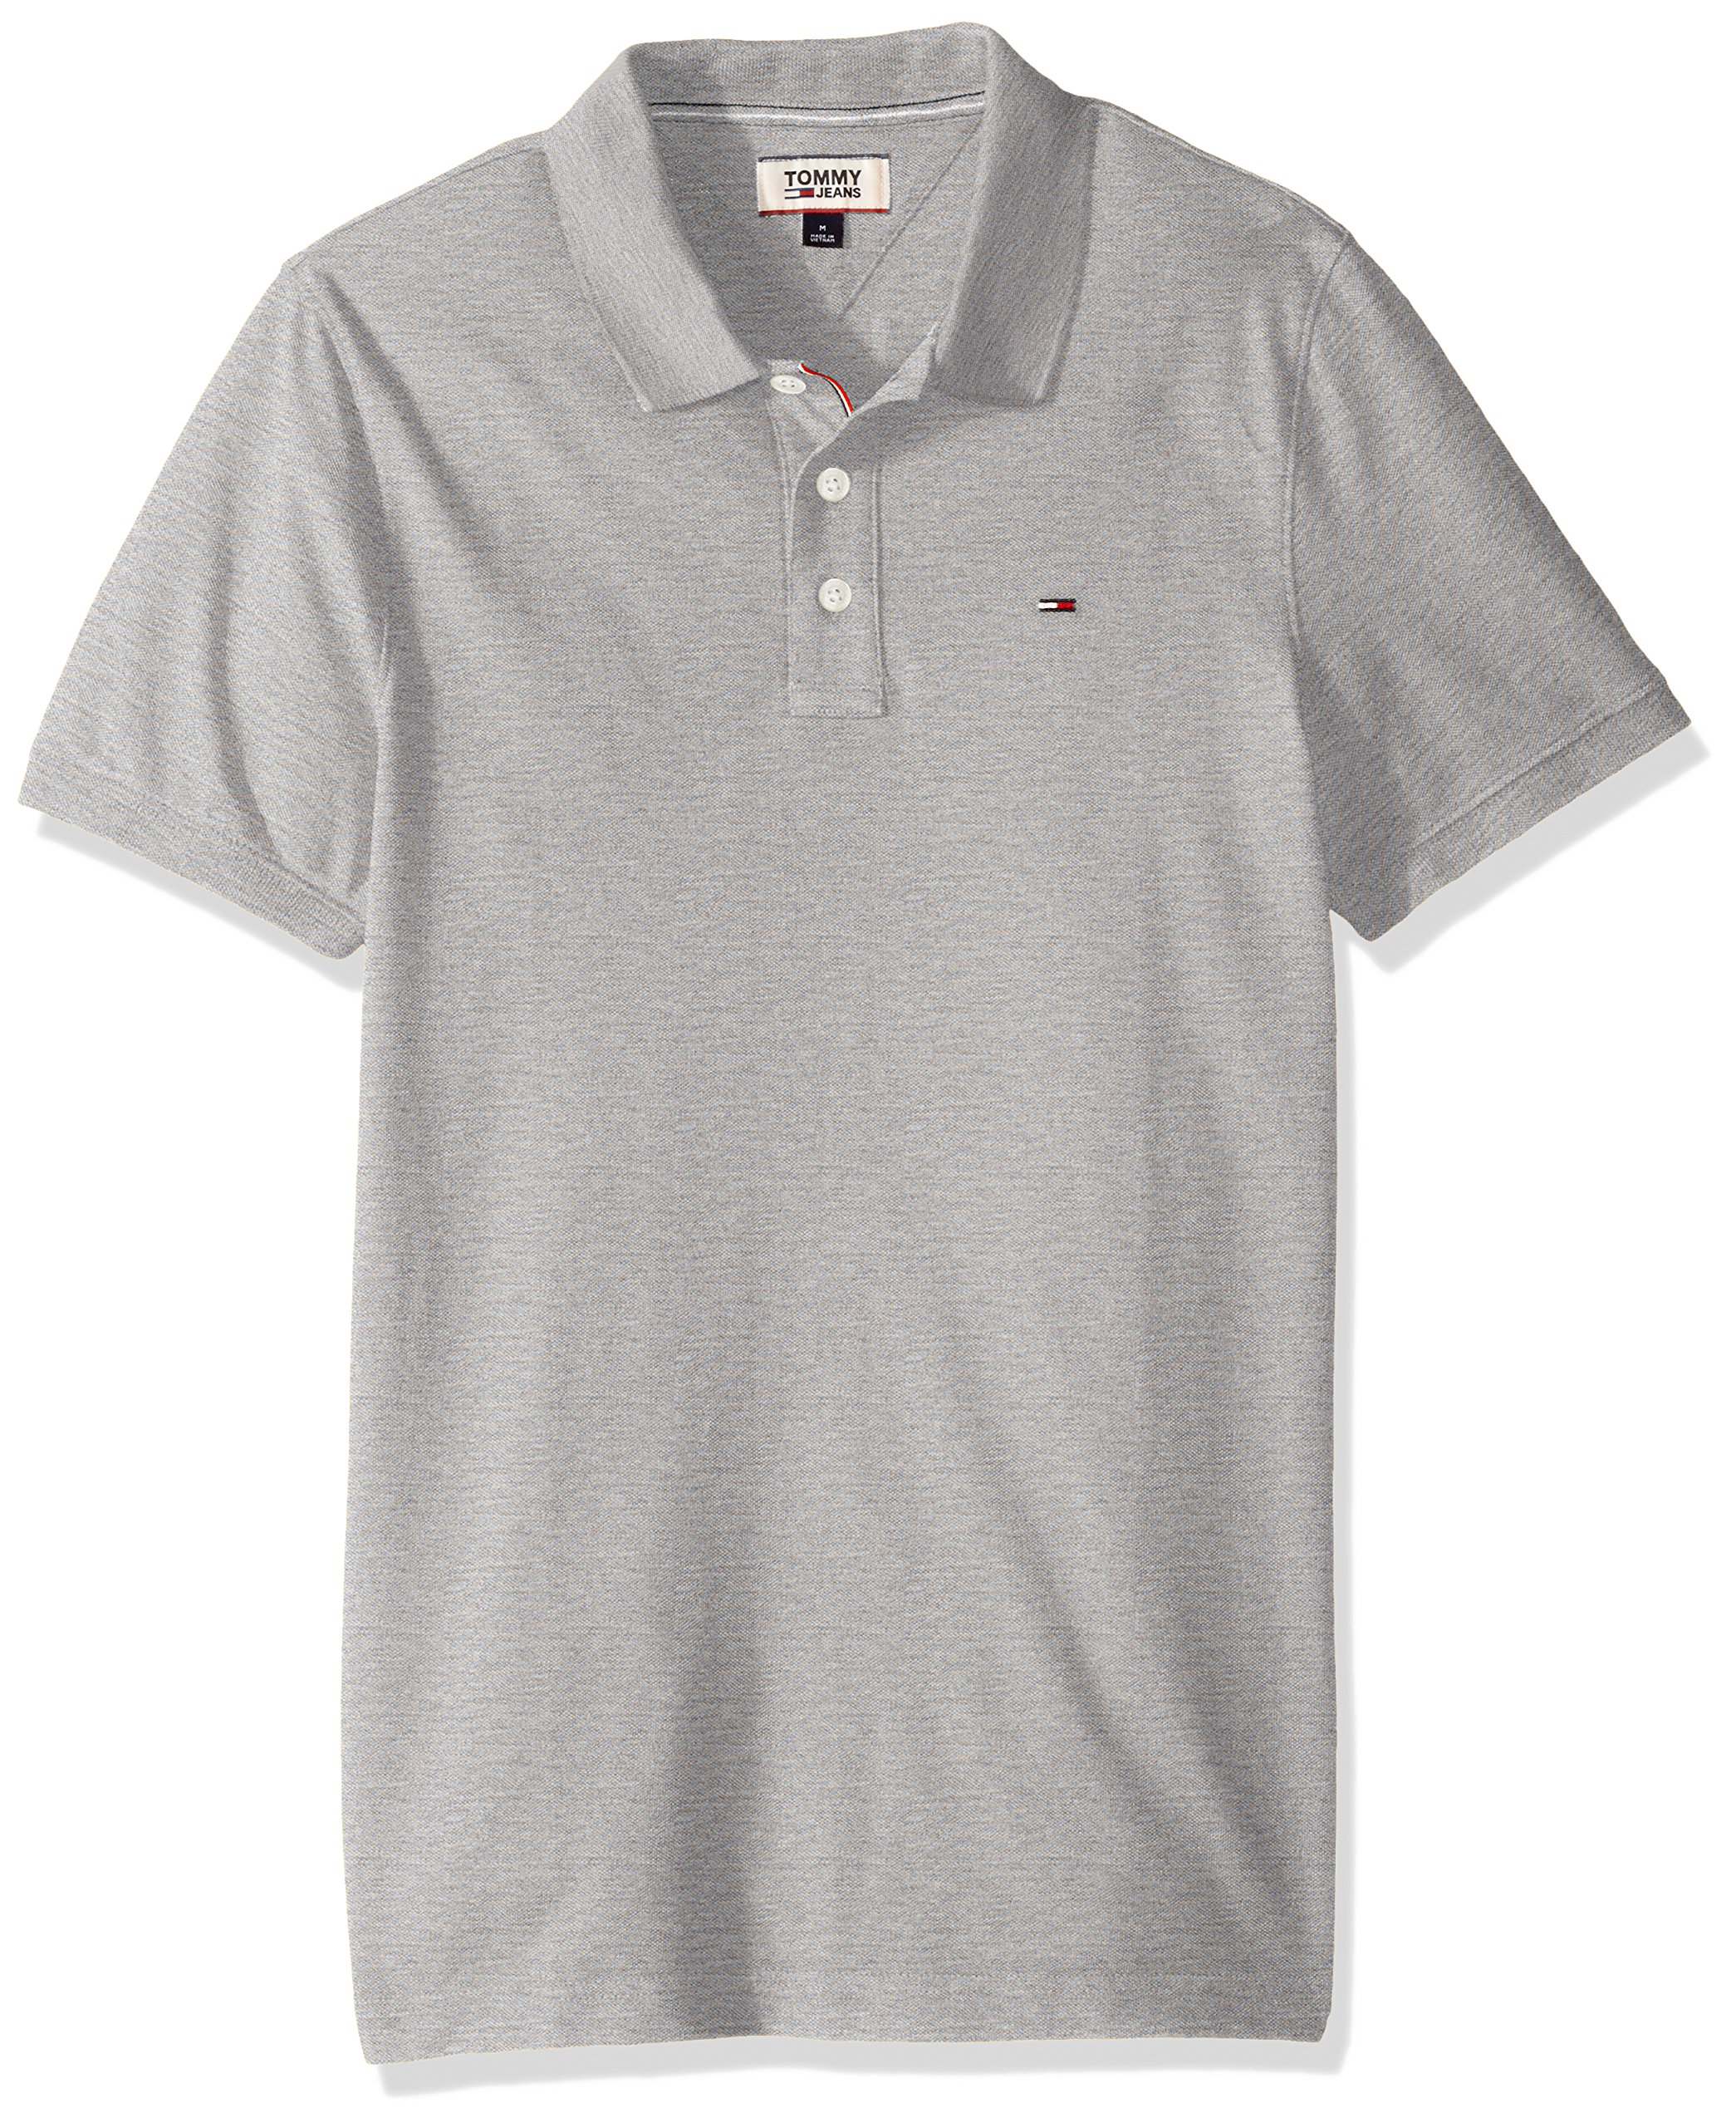 Tommy Jeans Basic Short Sleeved Polo Shirt (Light Grey Heather)